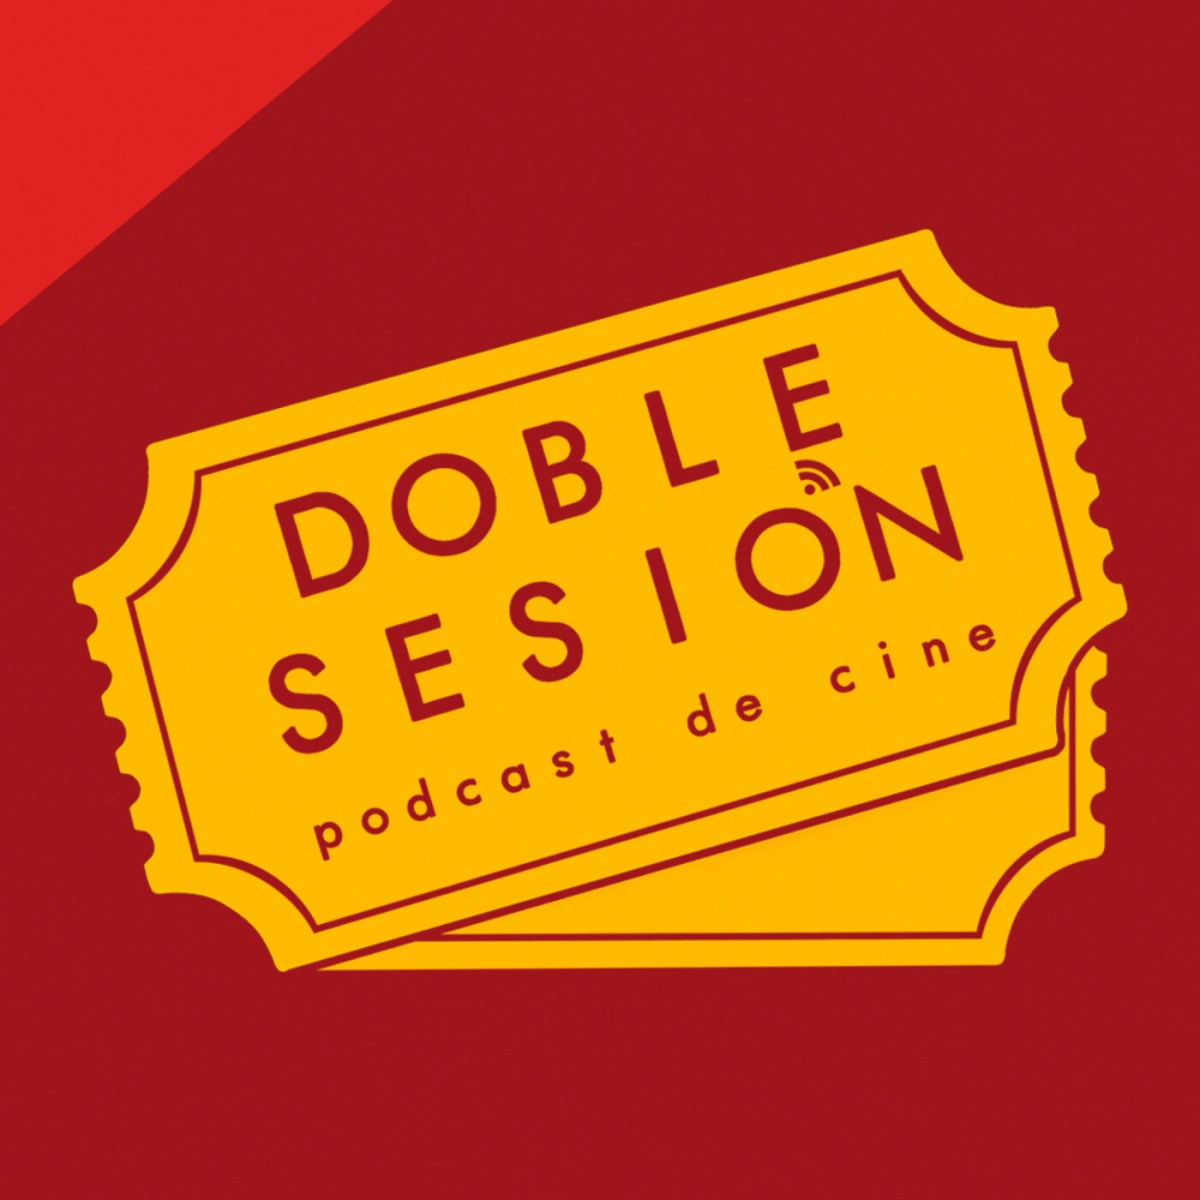 Doble Sesión Podcast de Cine